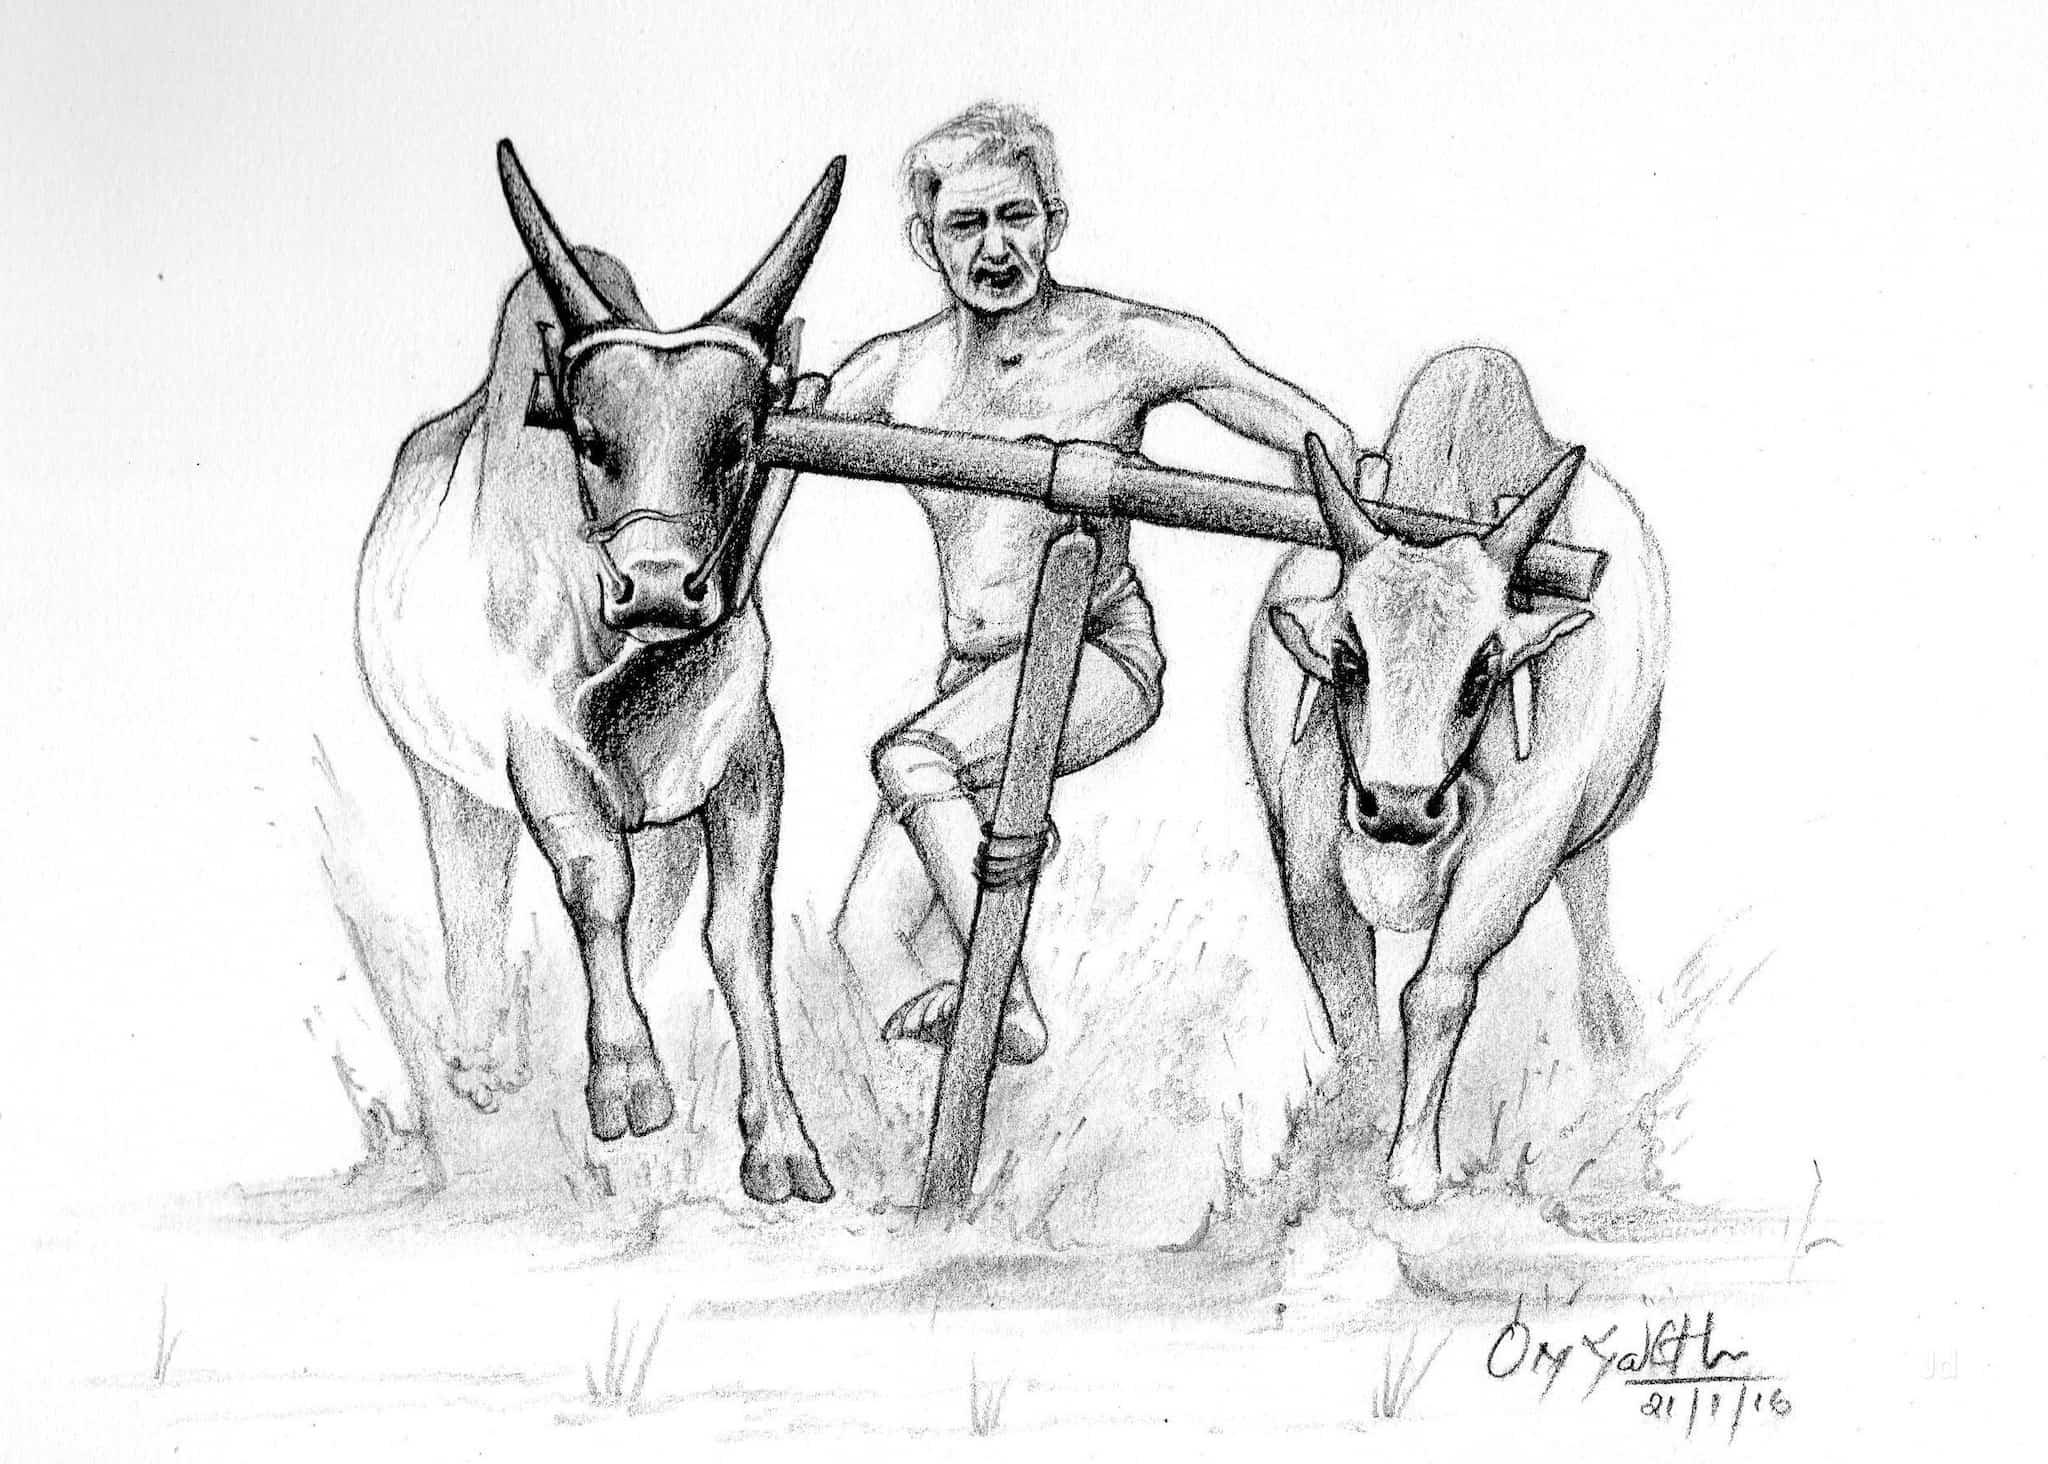 Vishwakarmart drawing villivakkam drawing classes in chennai justdial